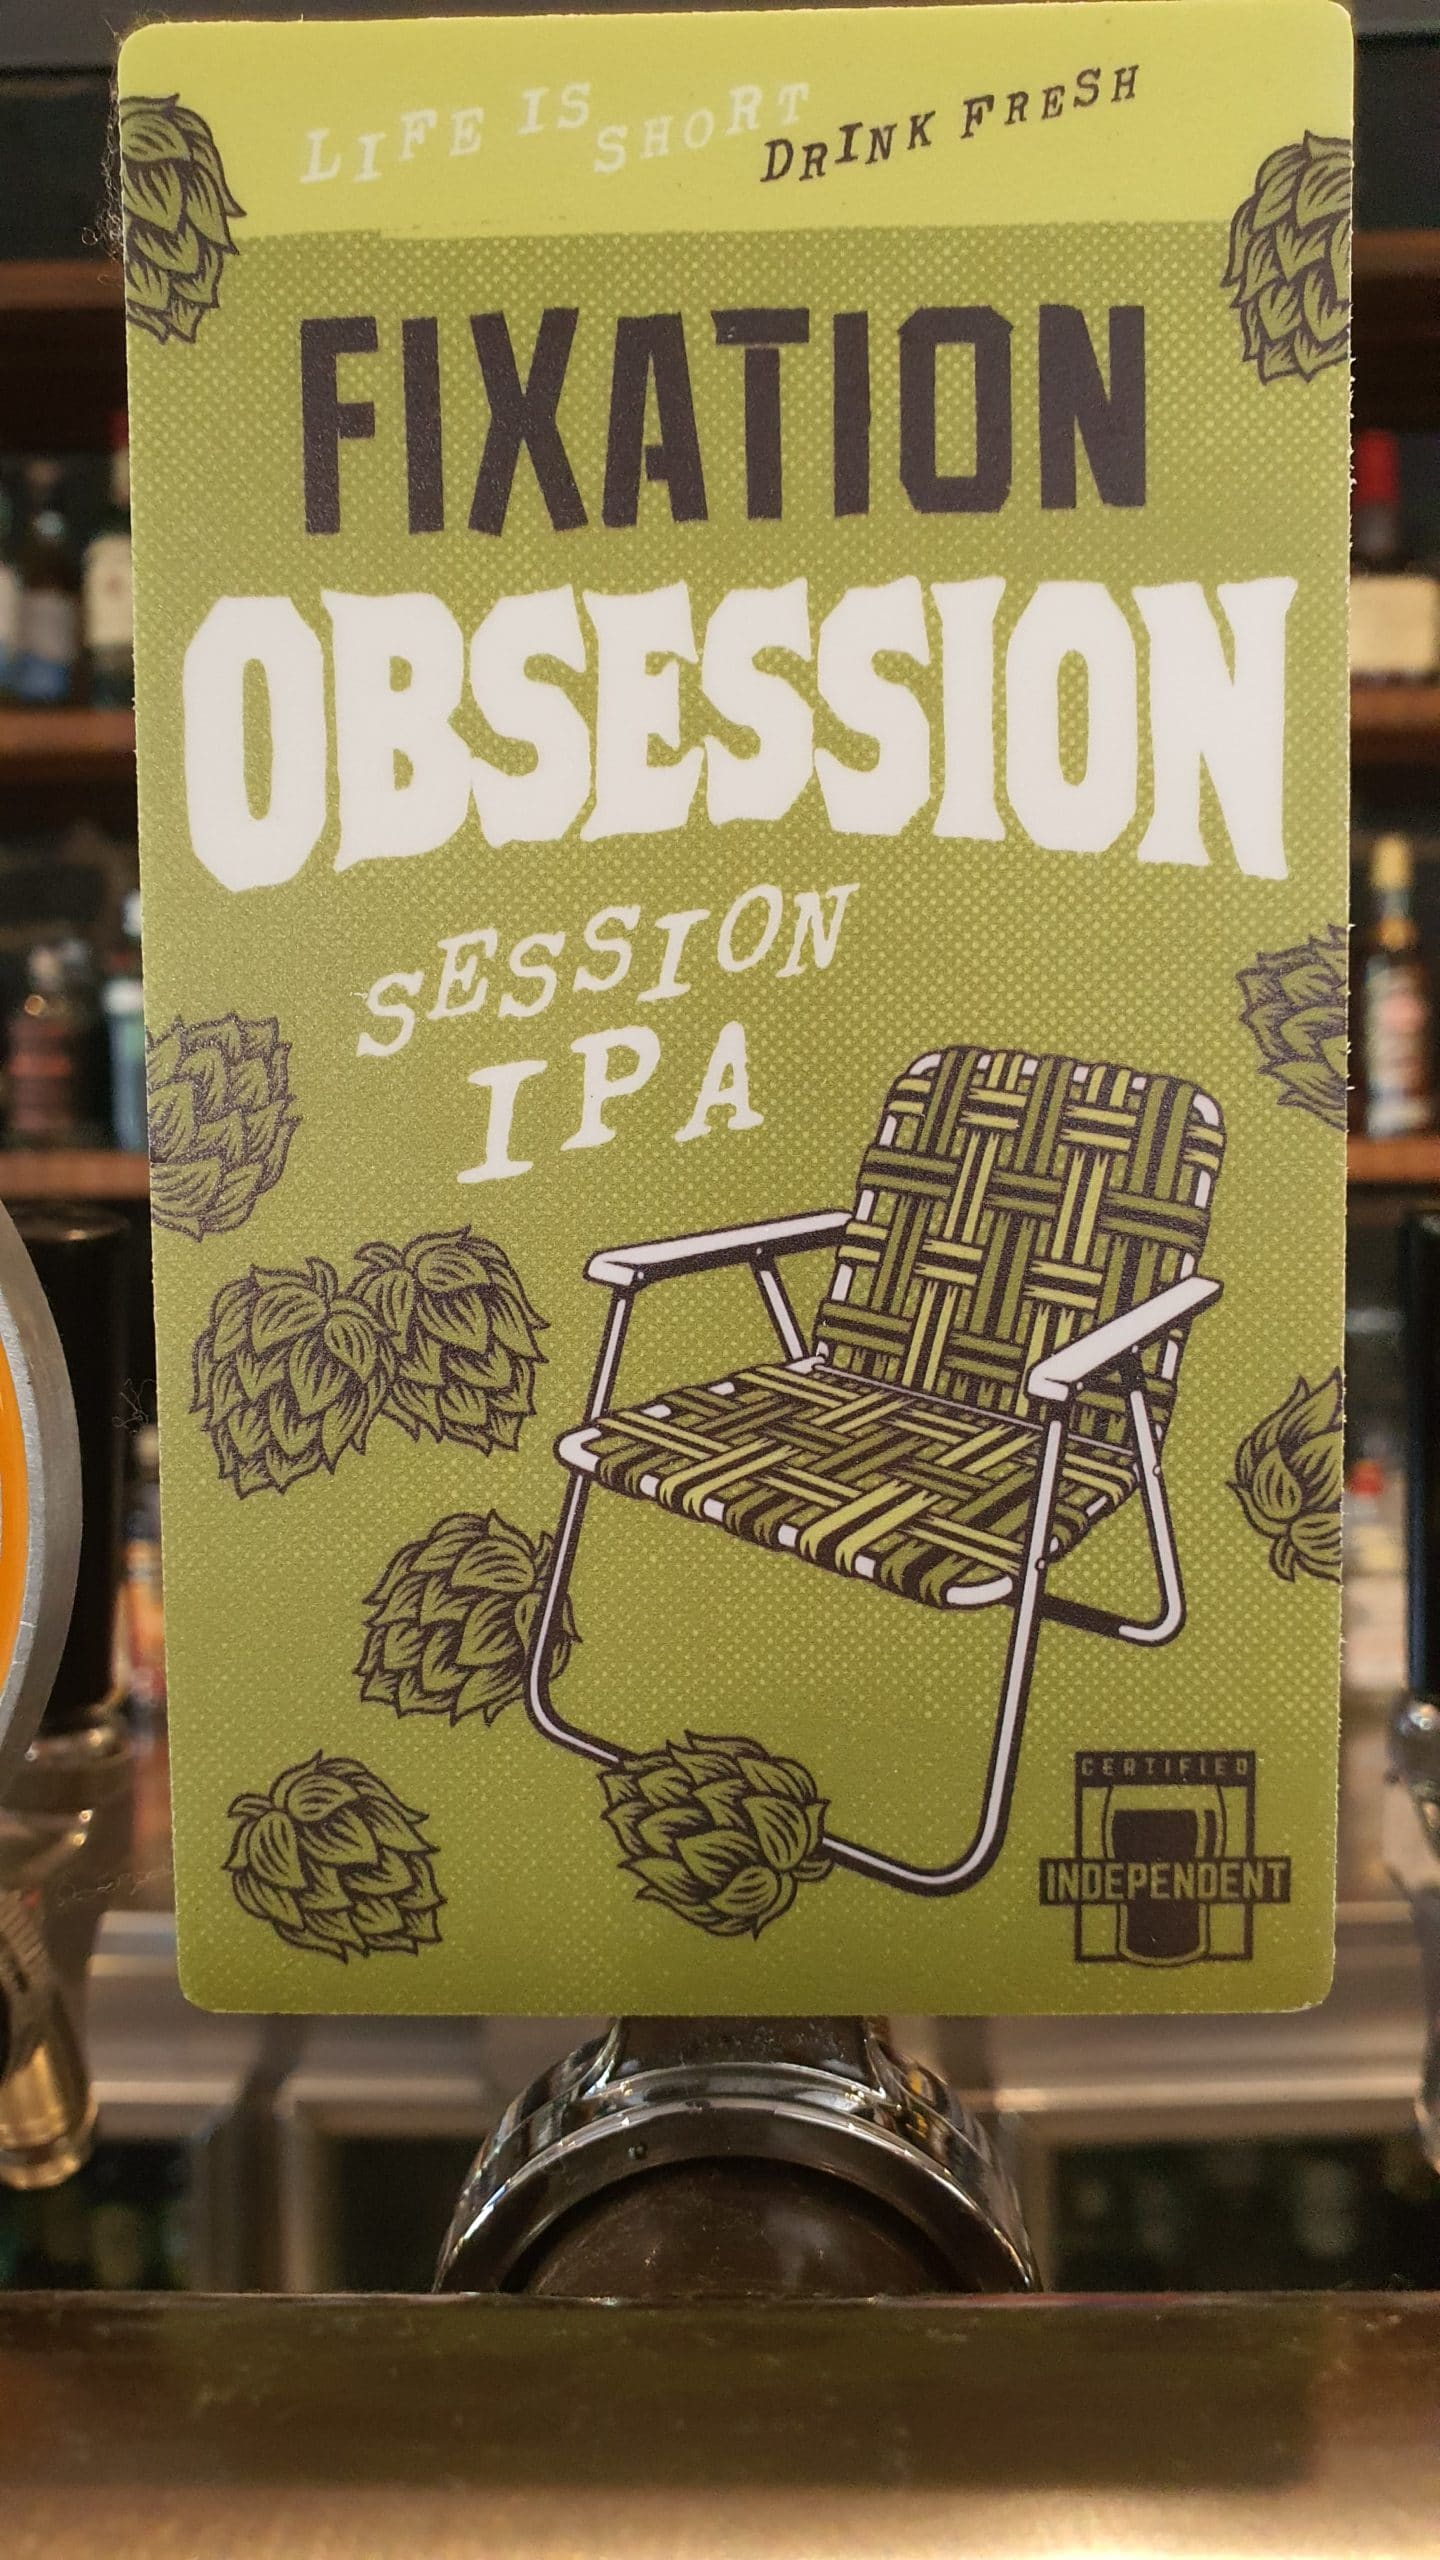 Fixation Obsession Session IPA